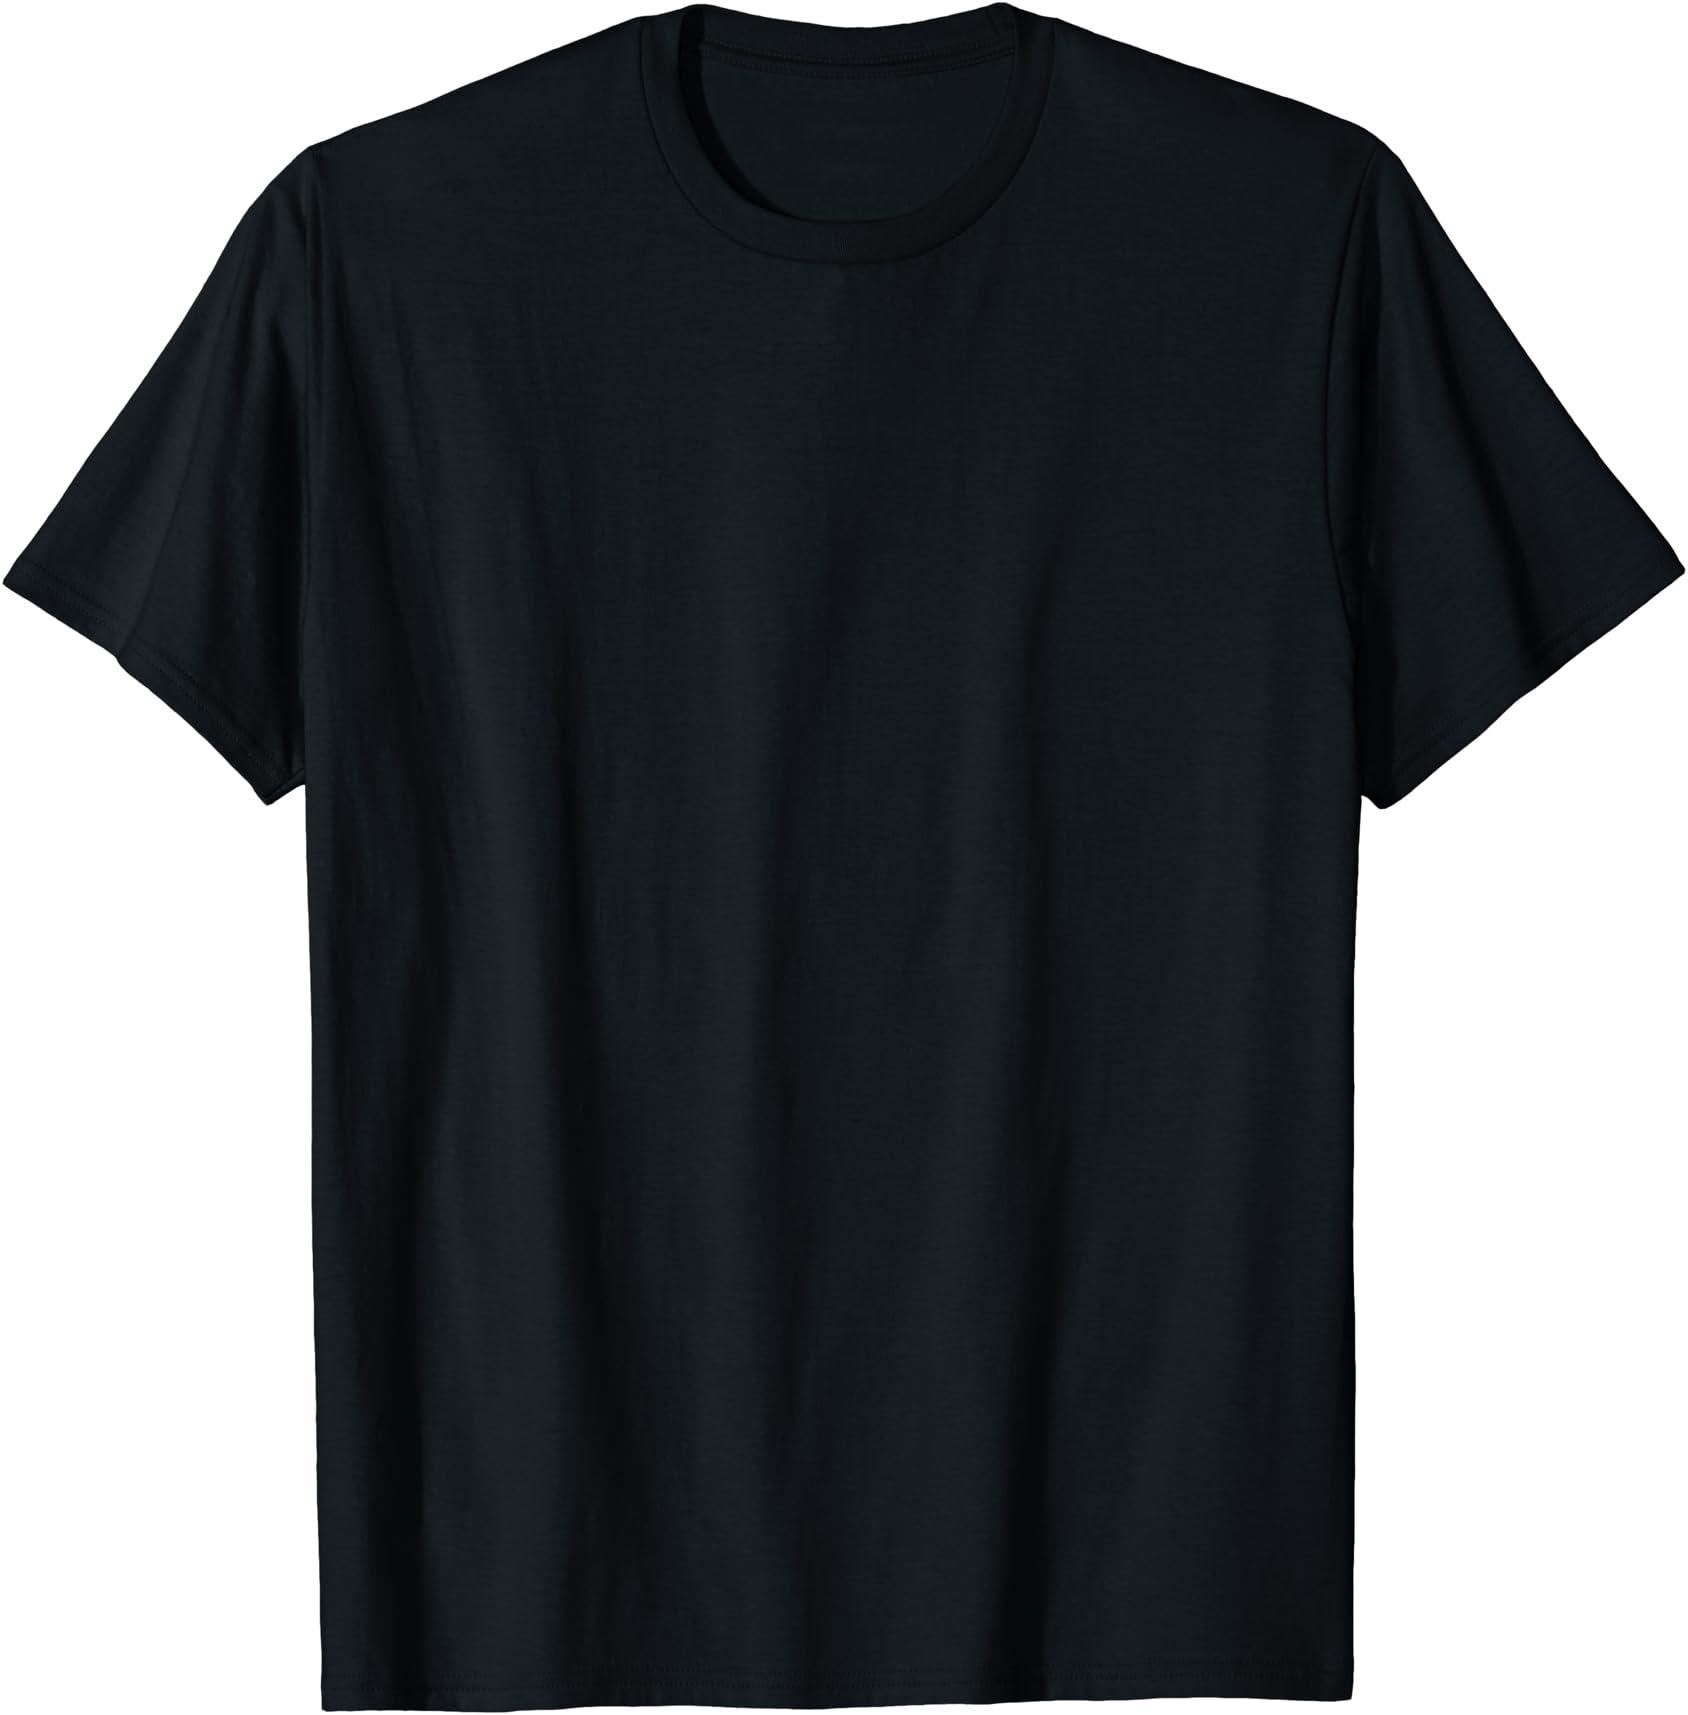 False Vintage Retro T-Shirt